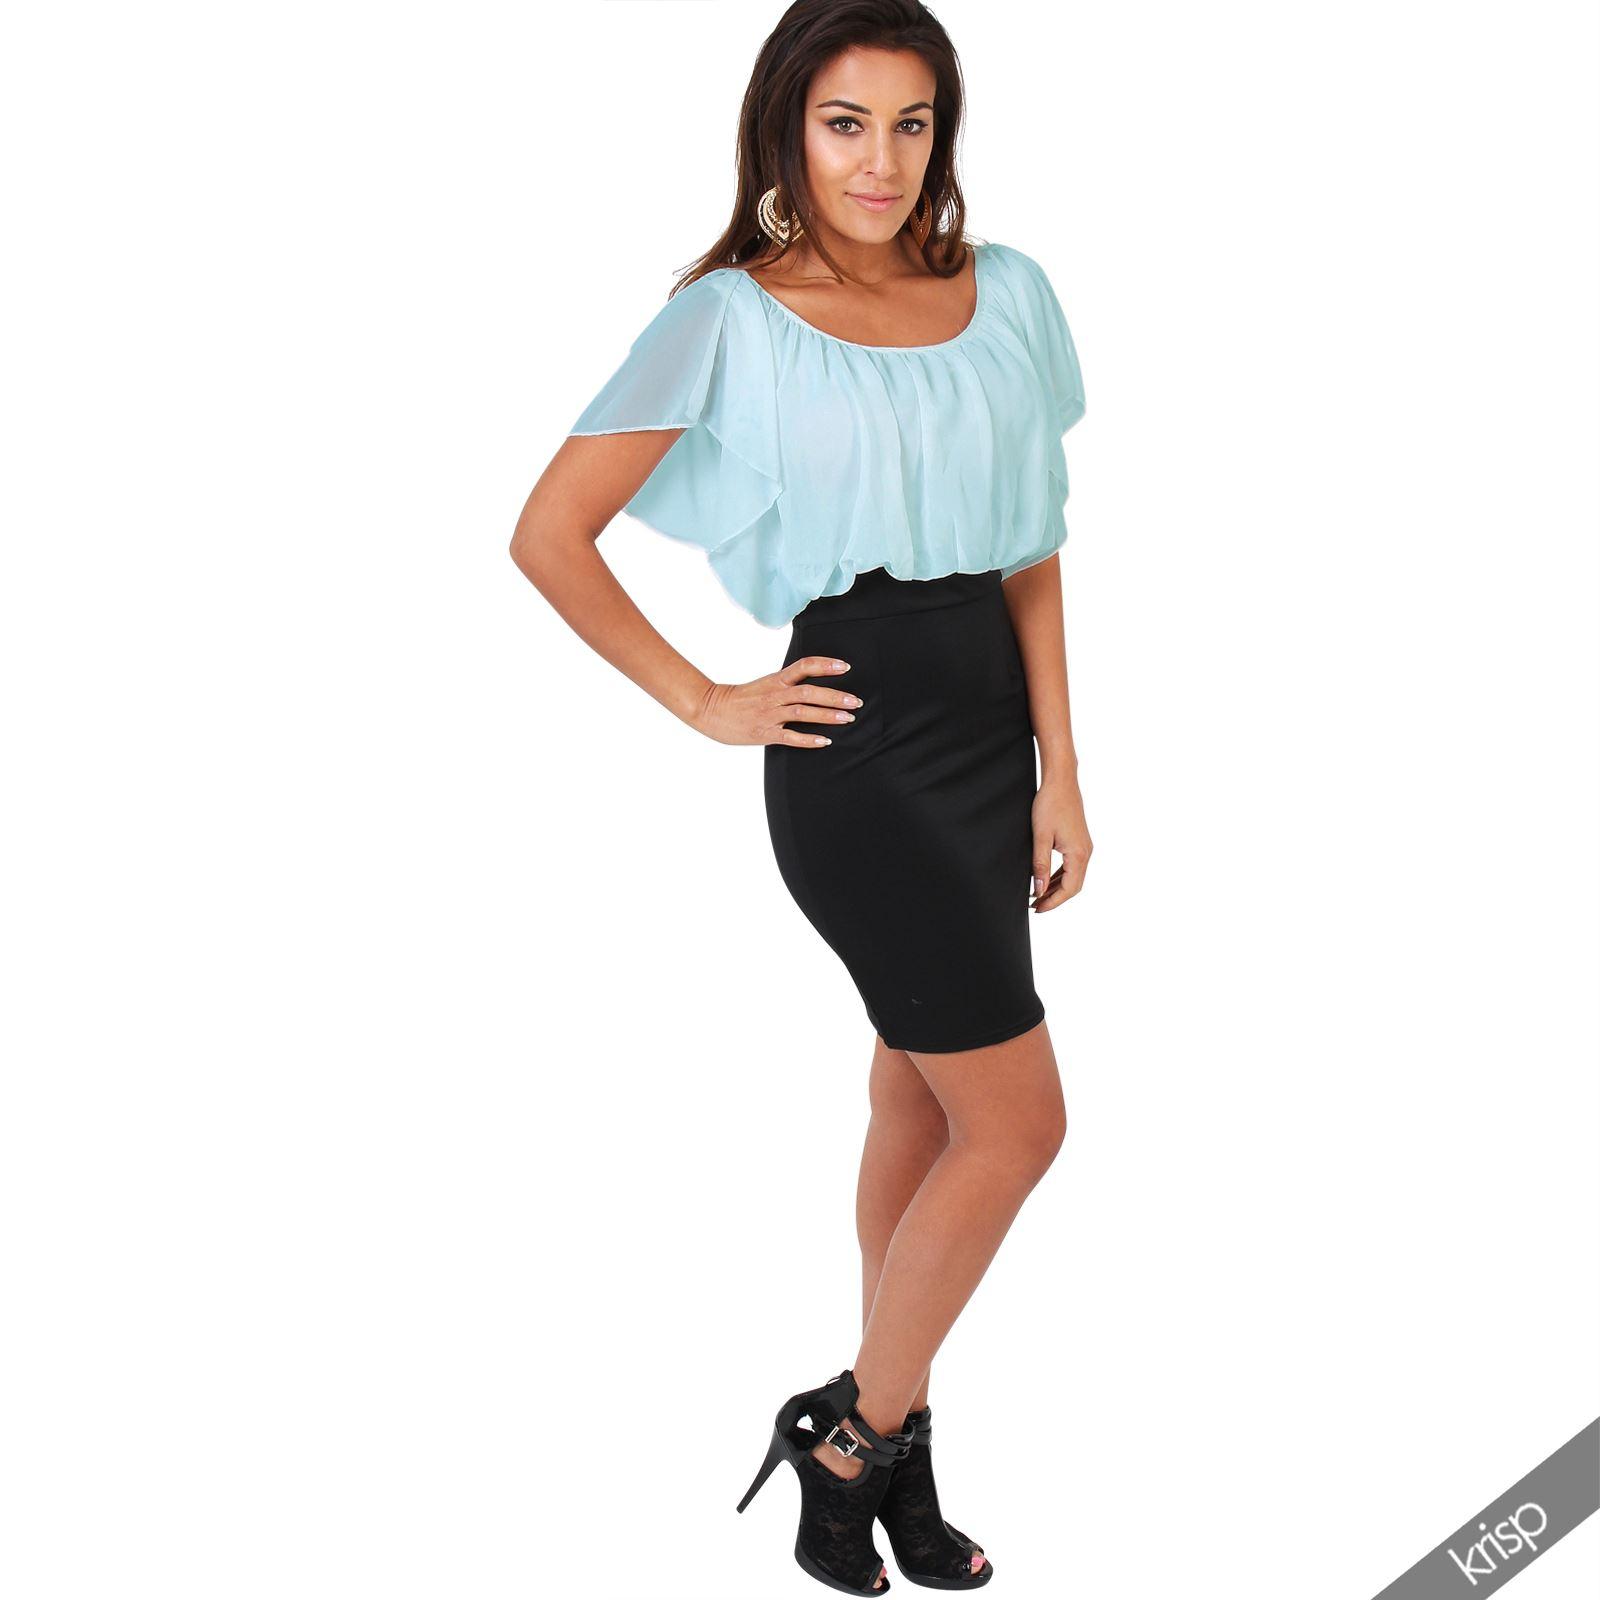 Womens-Pleated-Chiffon-Batwing-Top-High-Waist-Pencil-Bodycon-Skirt-Mini-Dress thumbnail 3